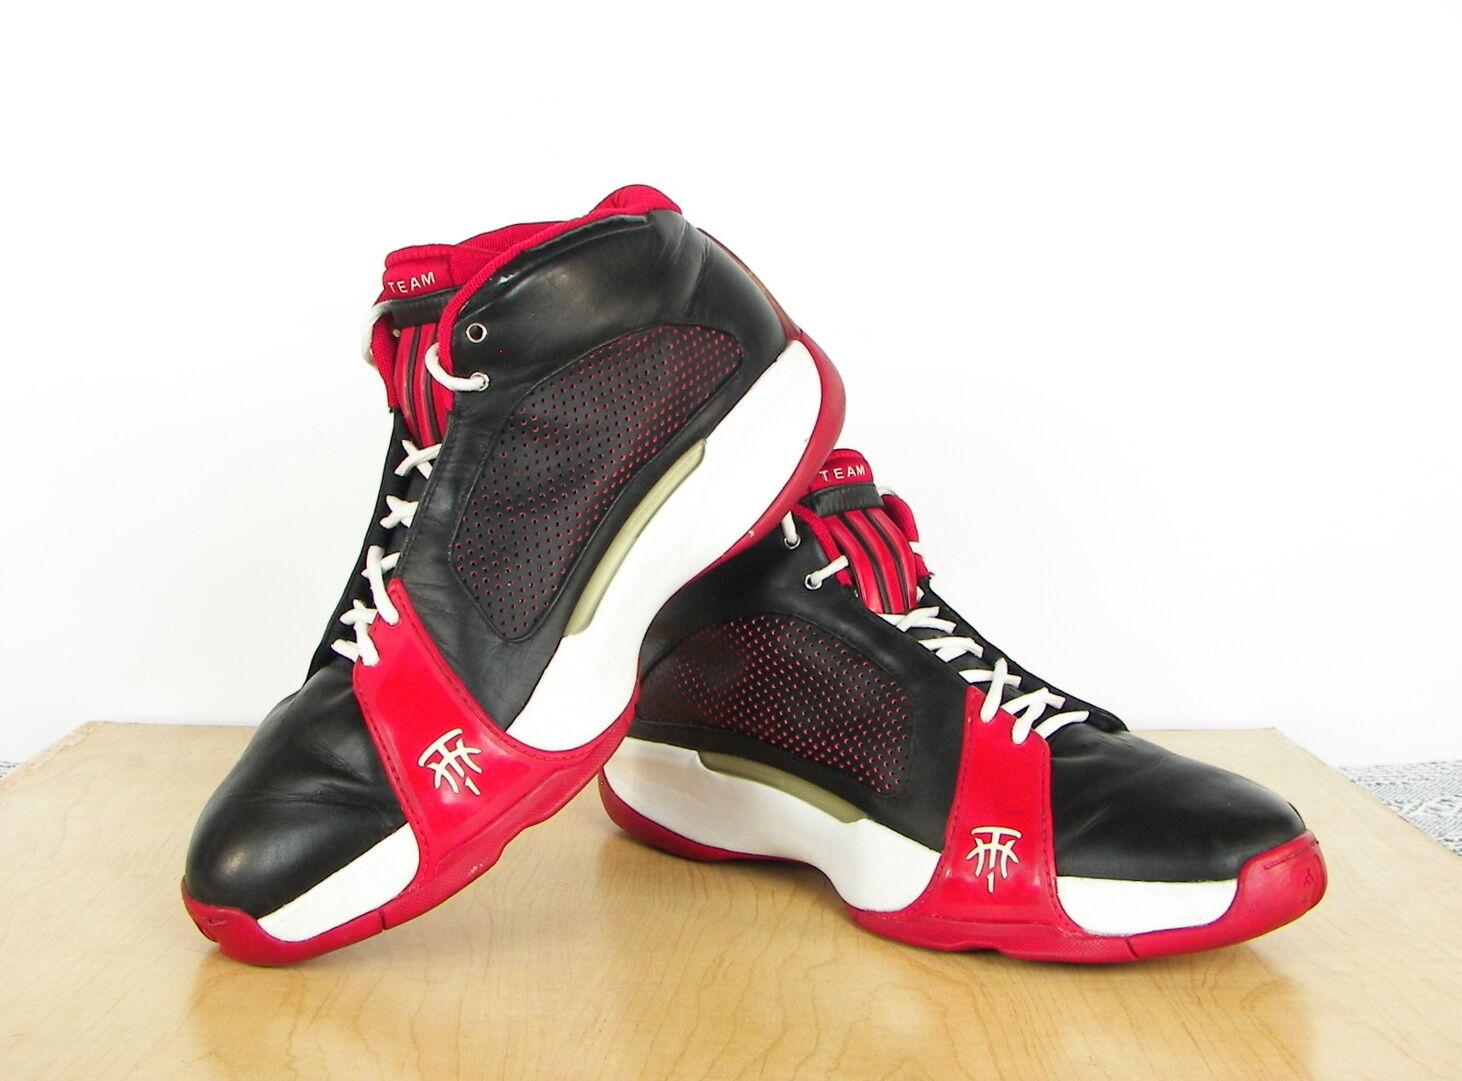 ADIDAS Tracy McGrady ADIPRENE Collectibl NBA Basketball 534887 SNEAKERS SIZE 15